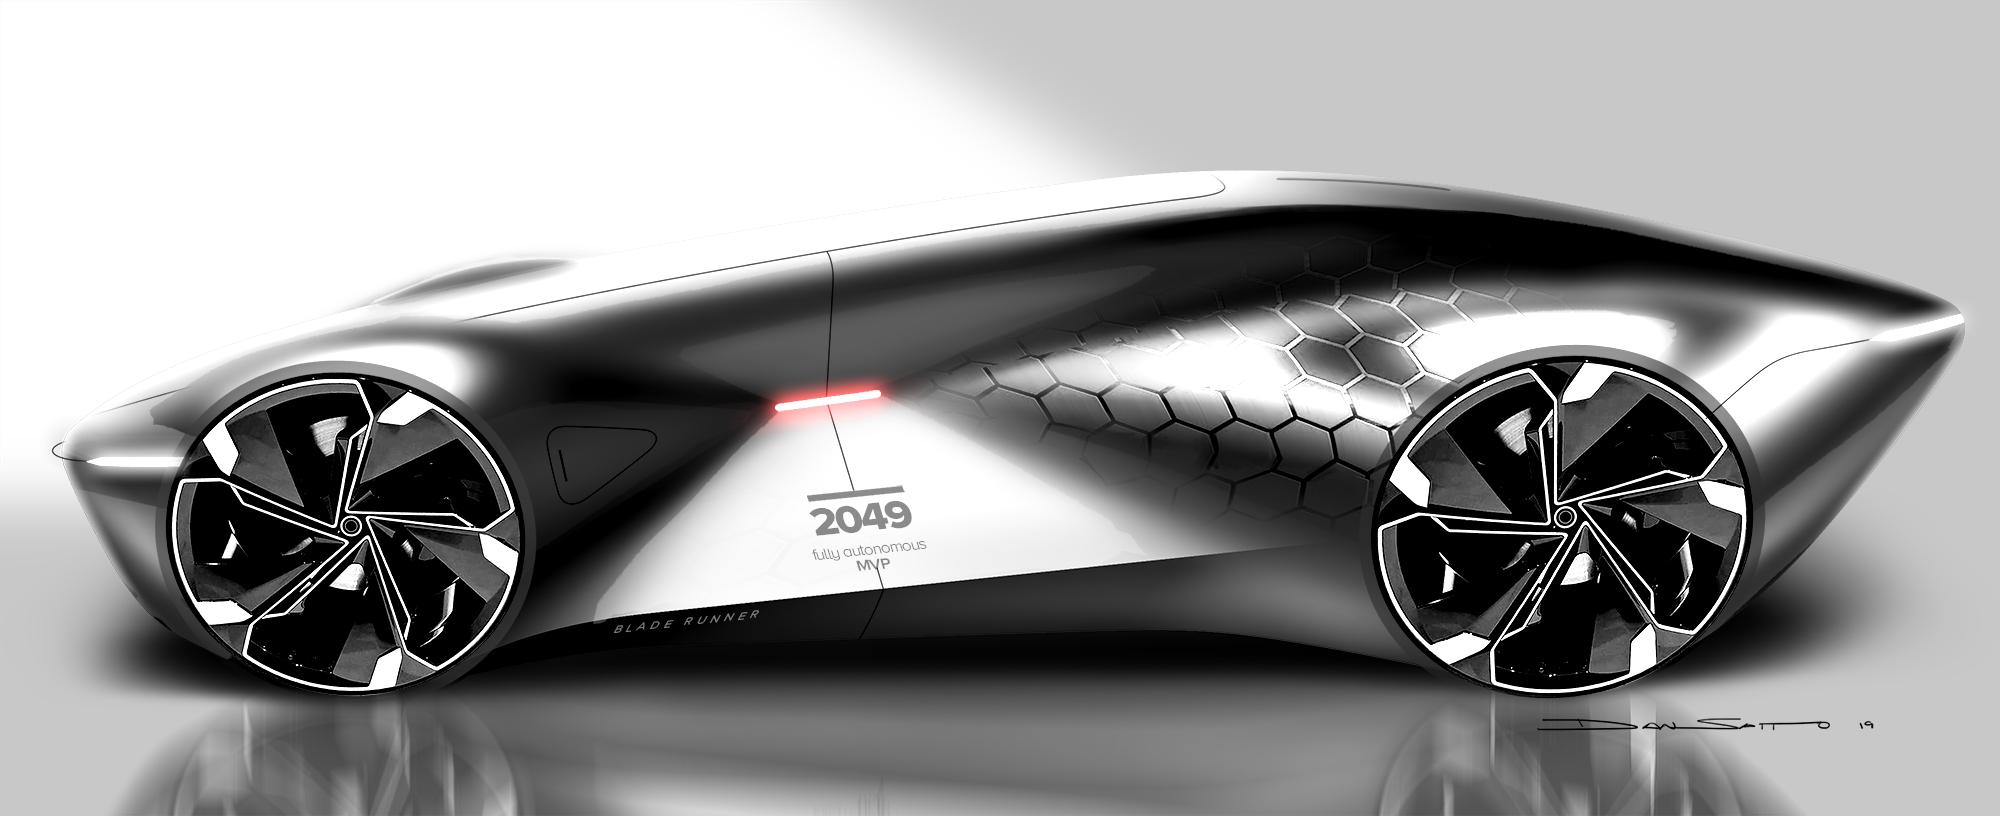 car_029_web.jpg